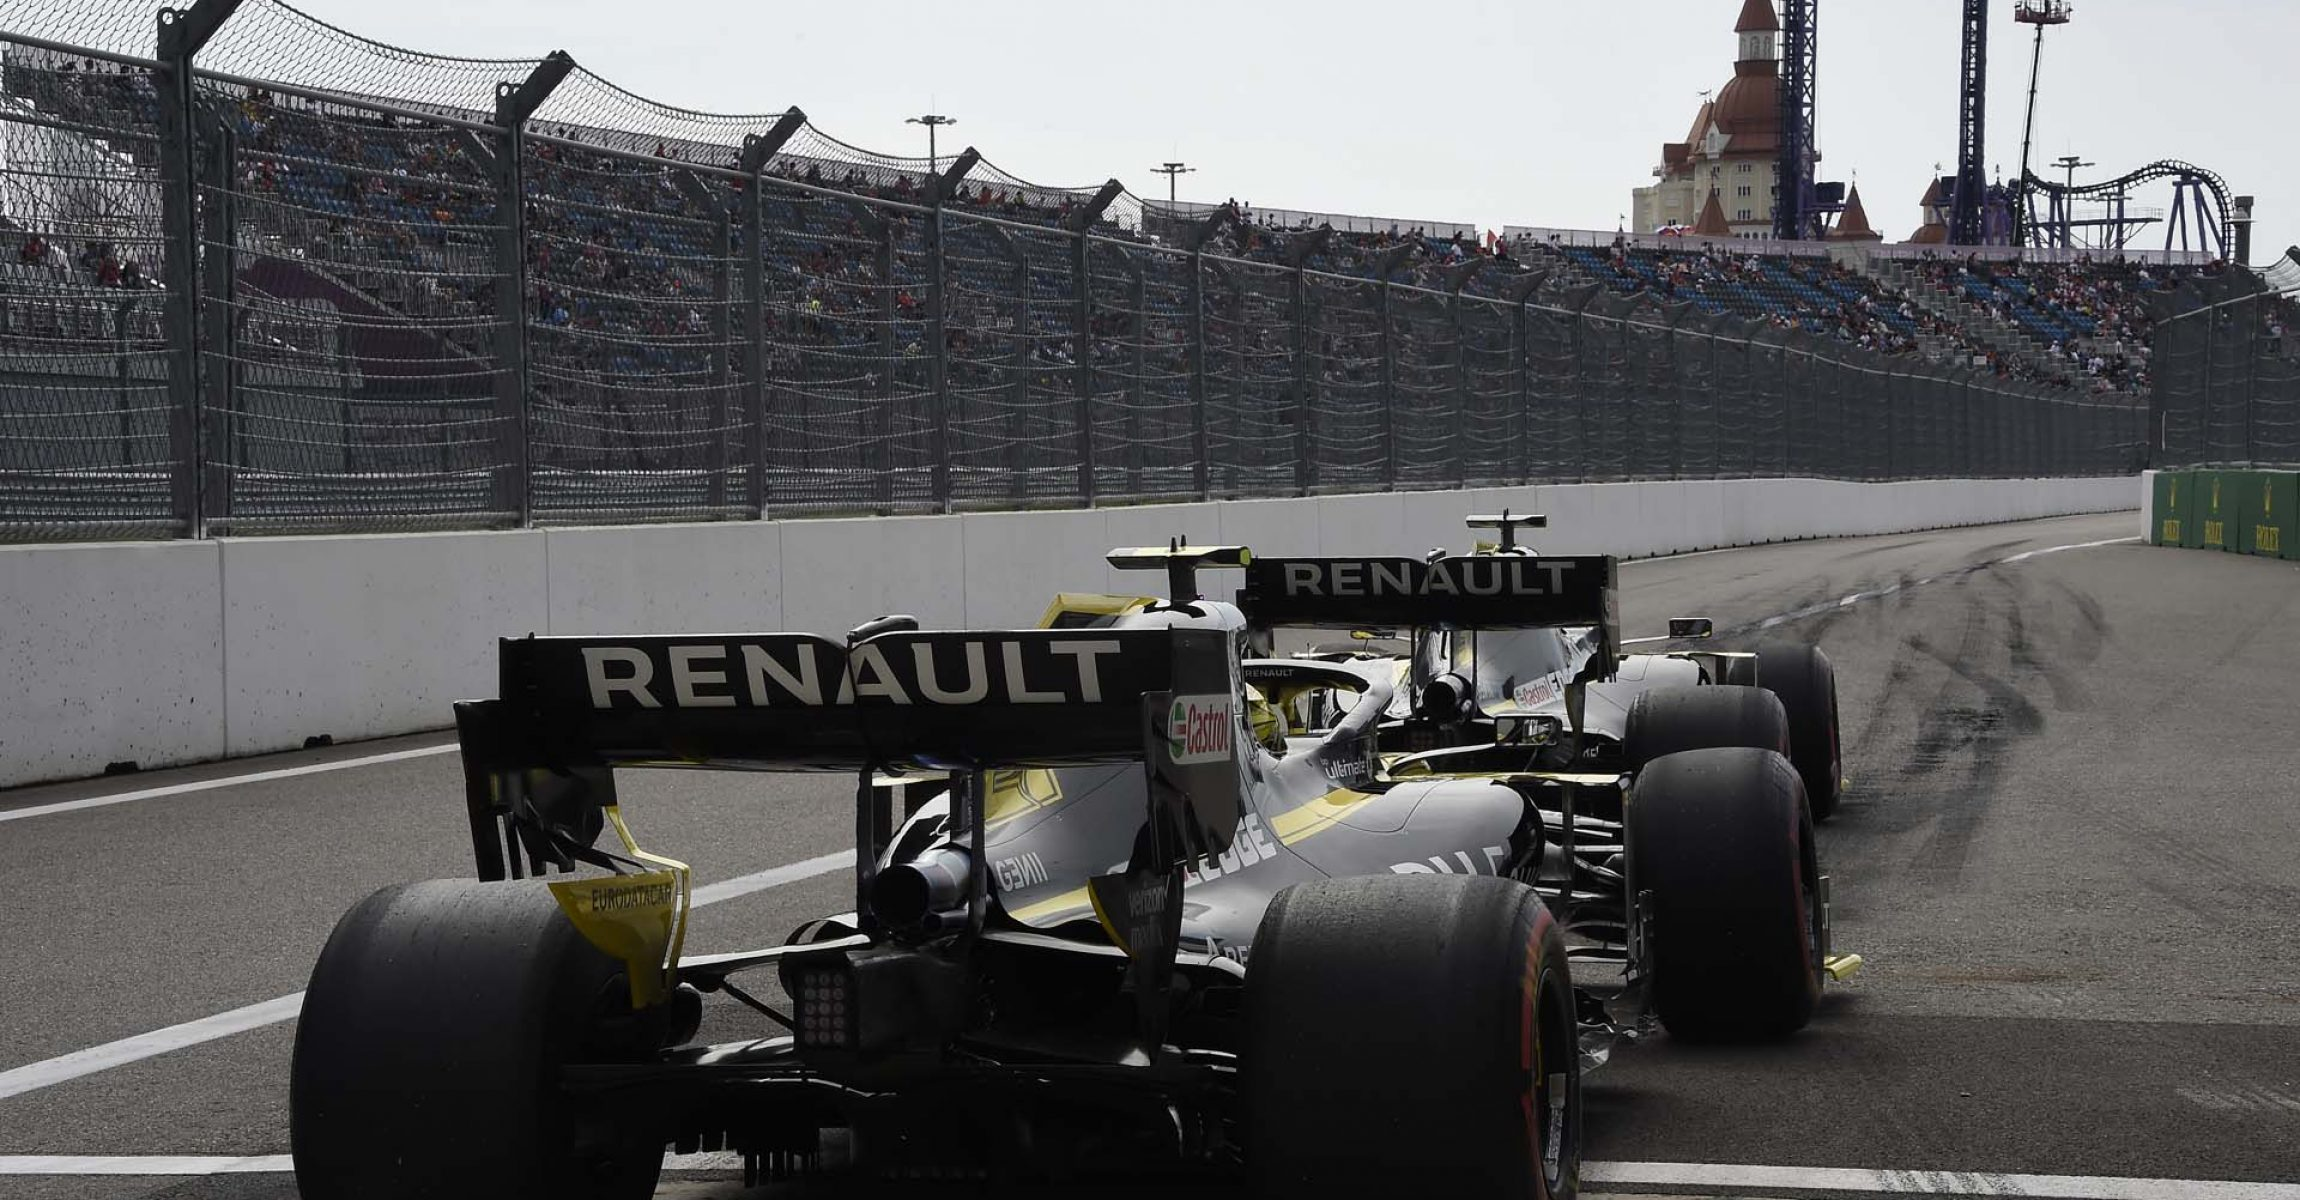 Daniel Ricciardo (AUS) Renault F1 Team RS19 and Nico Hulkenberg (GER) Renault F1 Team RS19 at the pit lane exit. Russian Grand Prix, Friday 27th September 2019. Sochi Autodrom, Sochi, Russia.